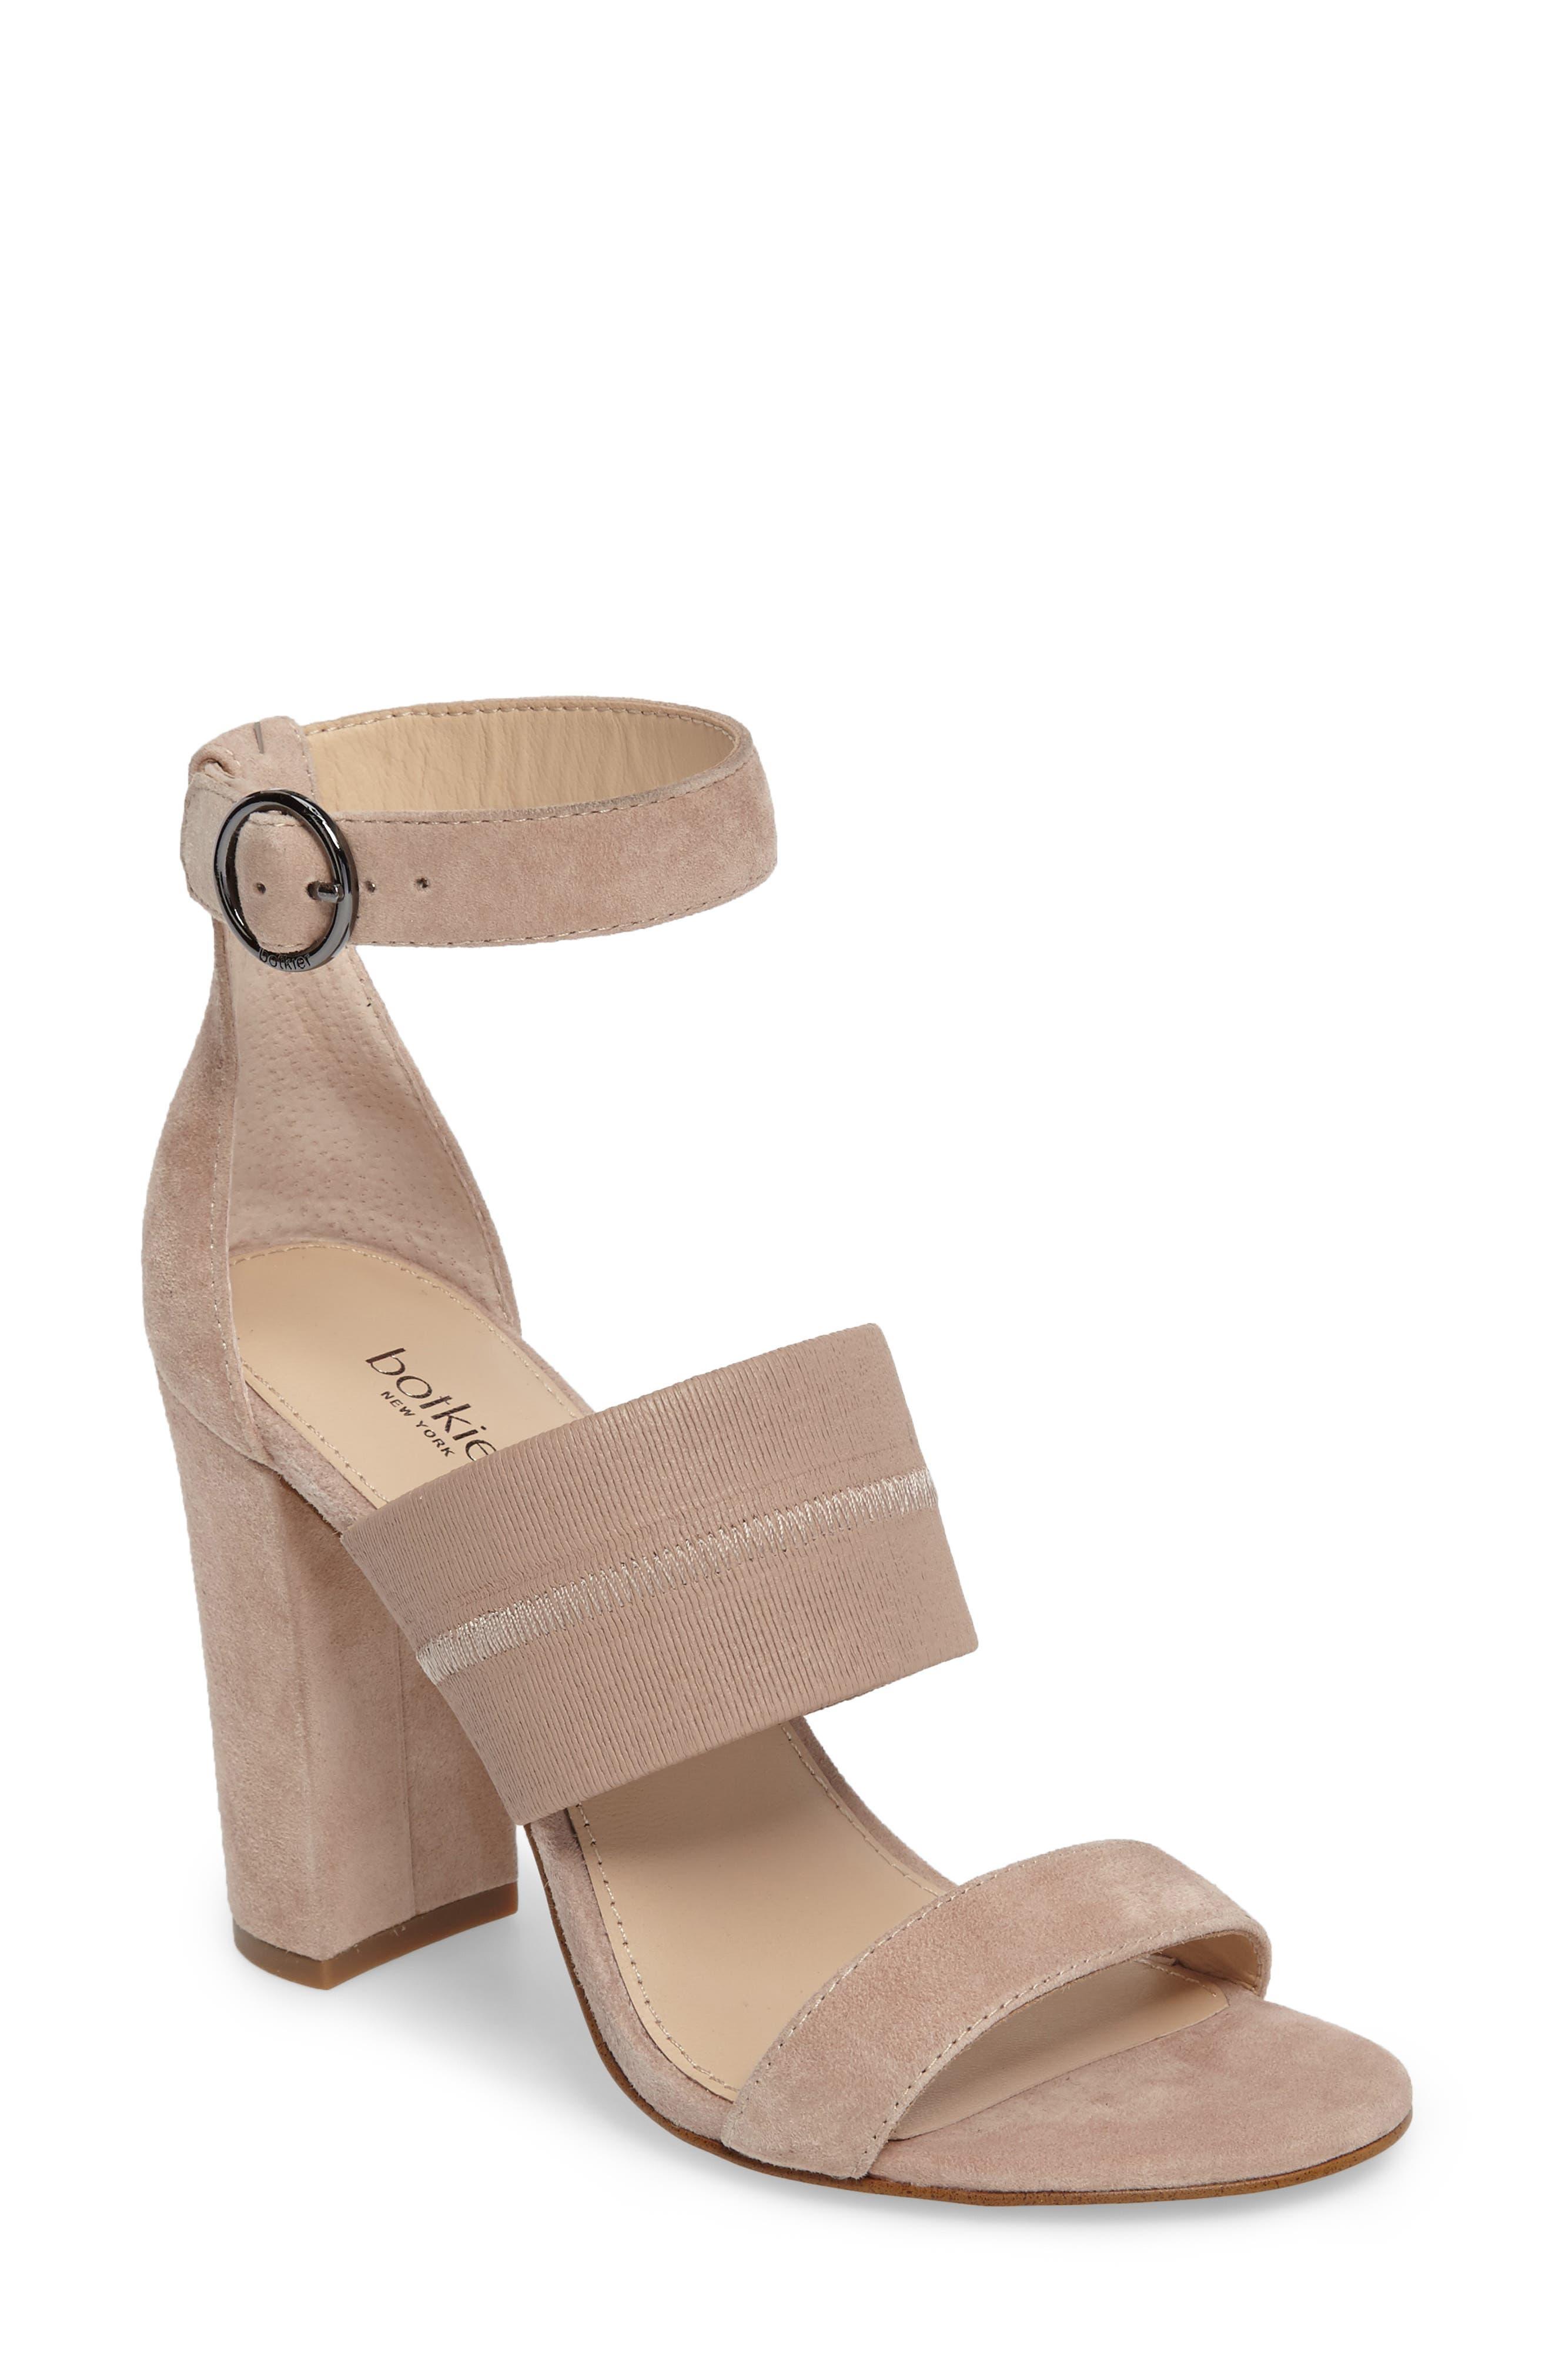 Gisella Ankle Strap Sandal,                             Main thumbnail 2, color,